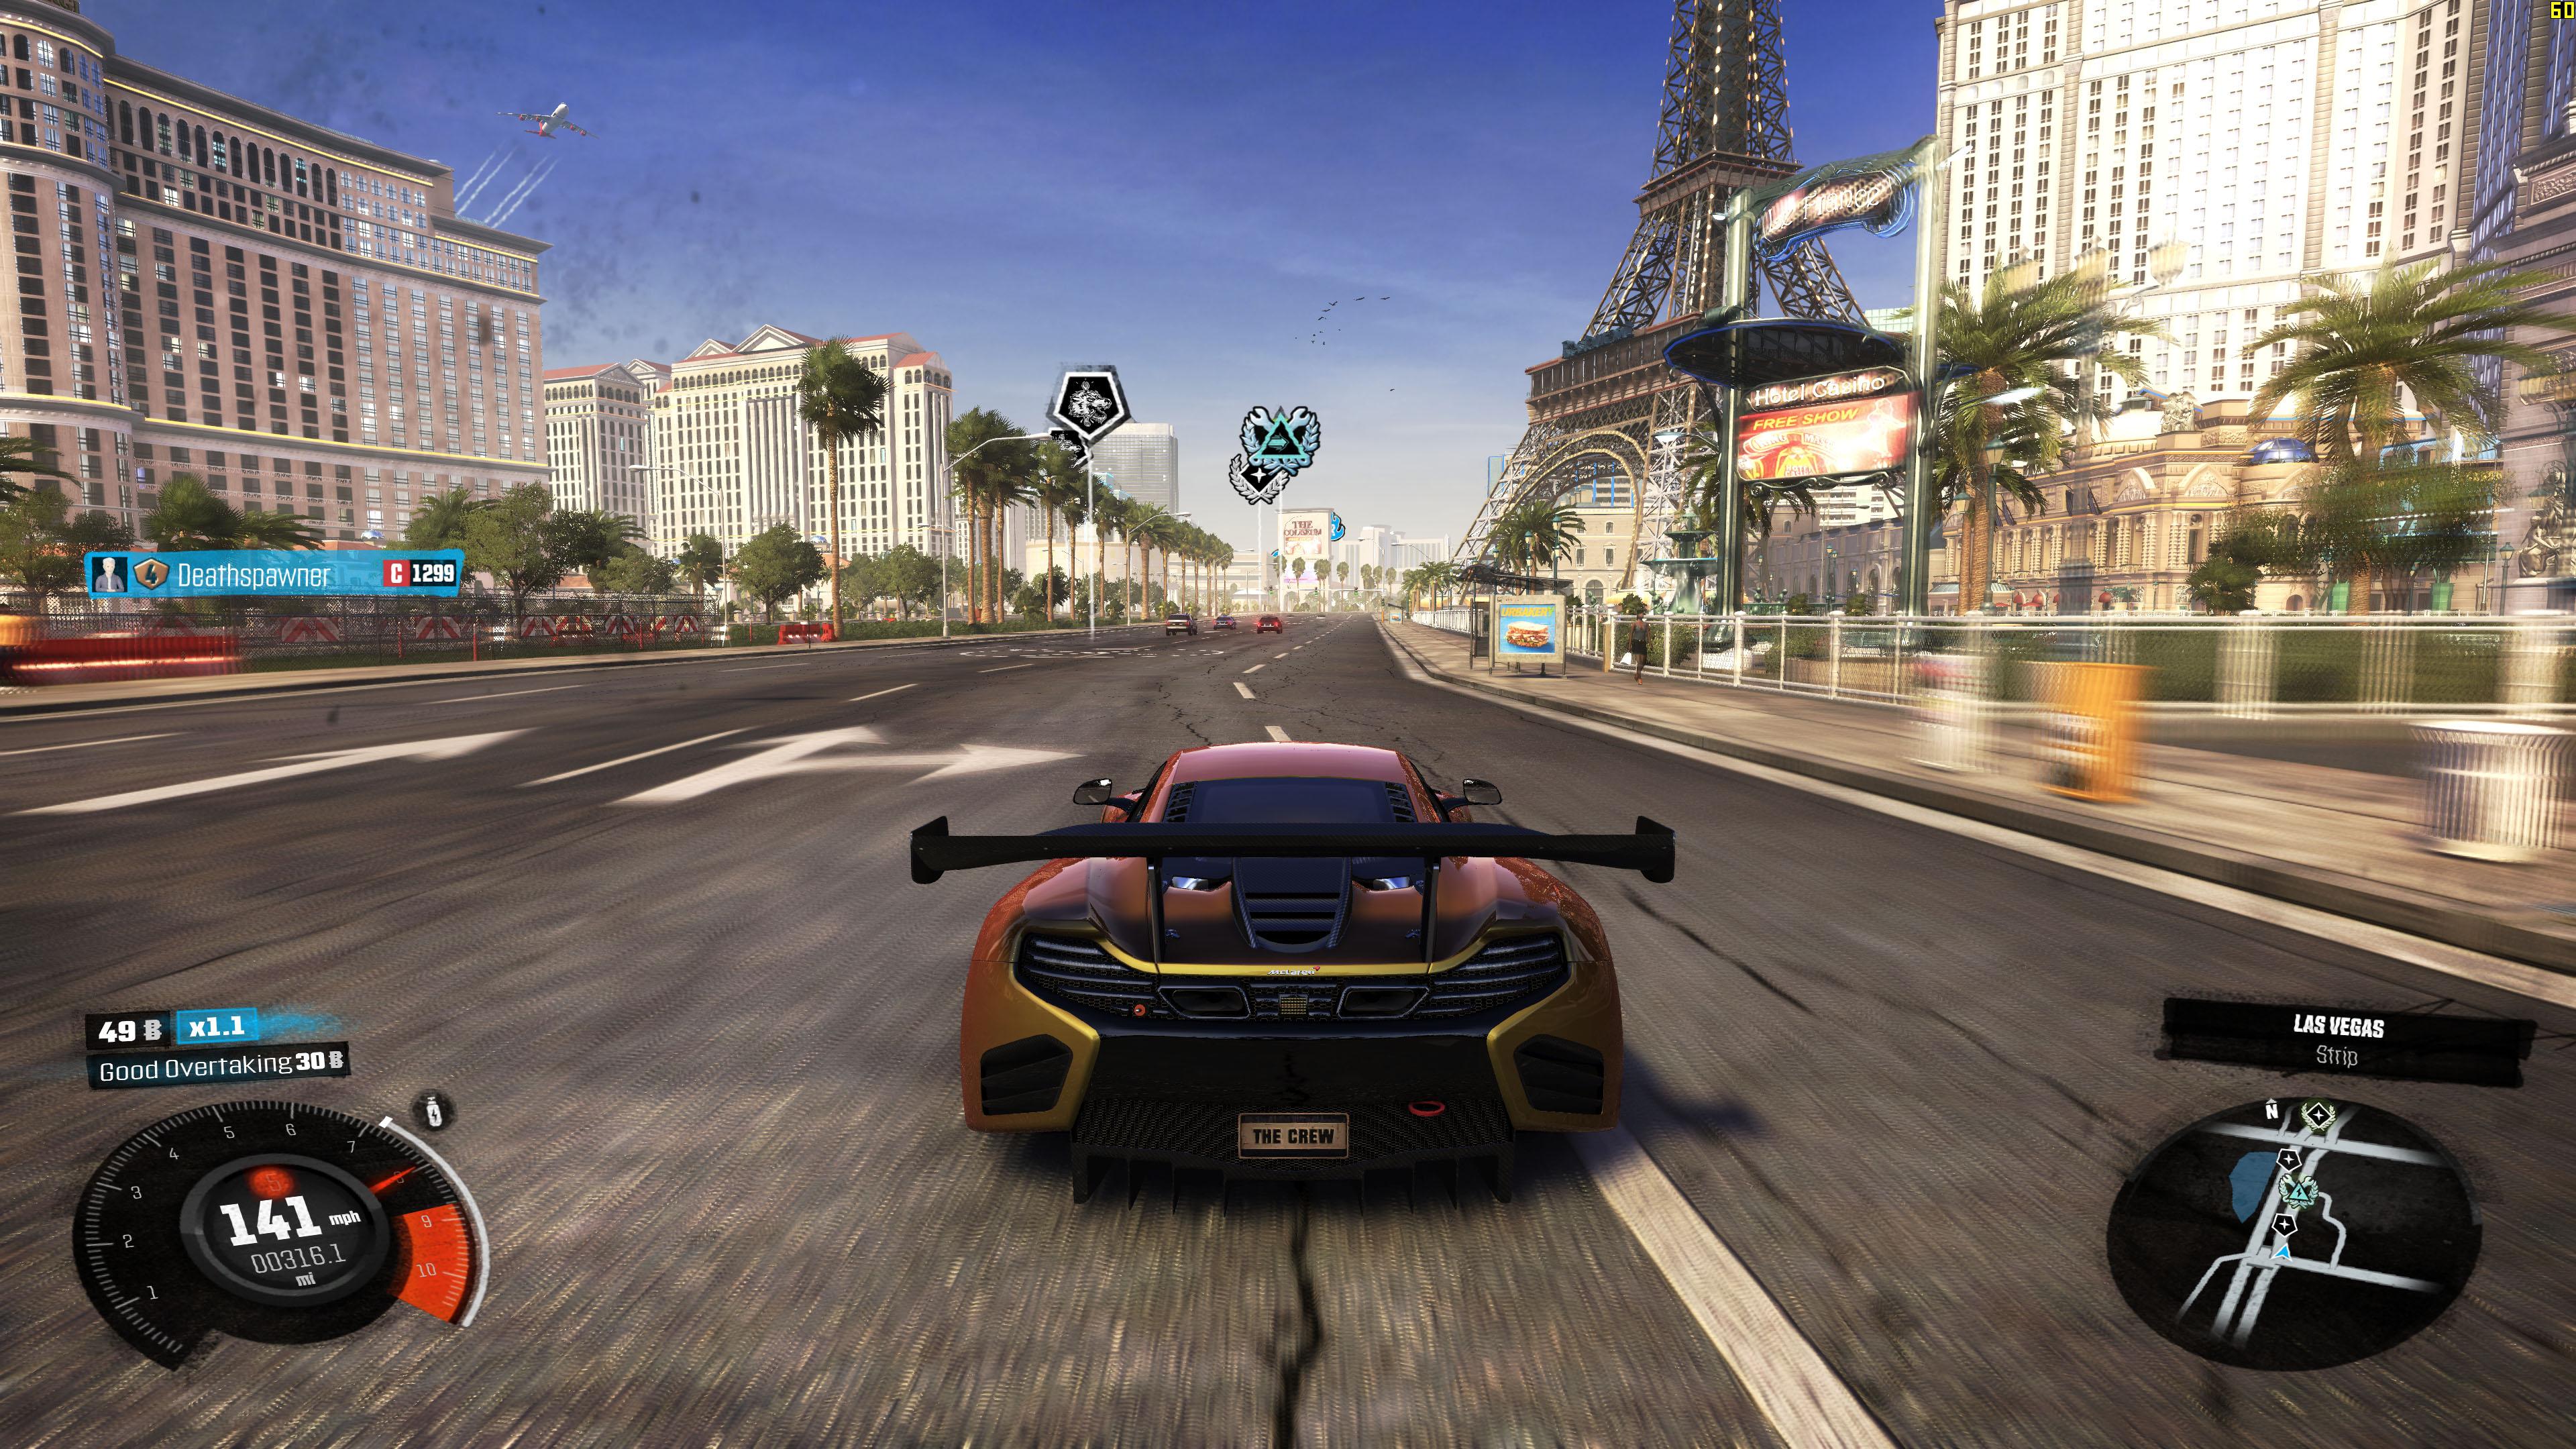 NVIDIA GeForce GTX 980 Ti Overclocking & Best Playable Settings